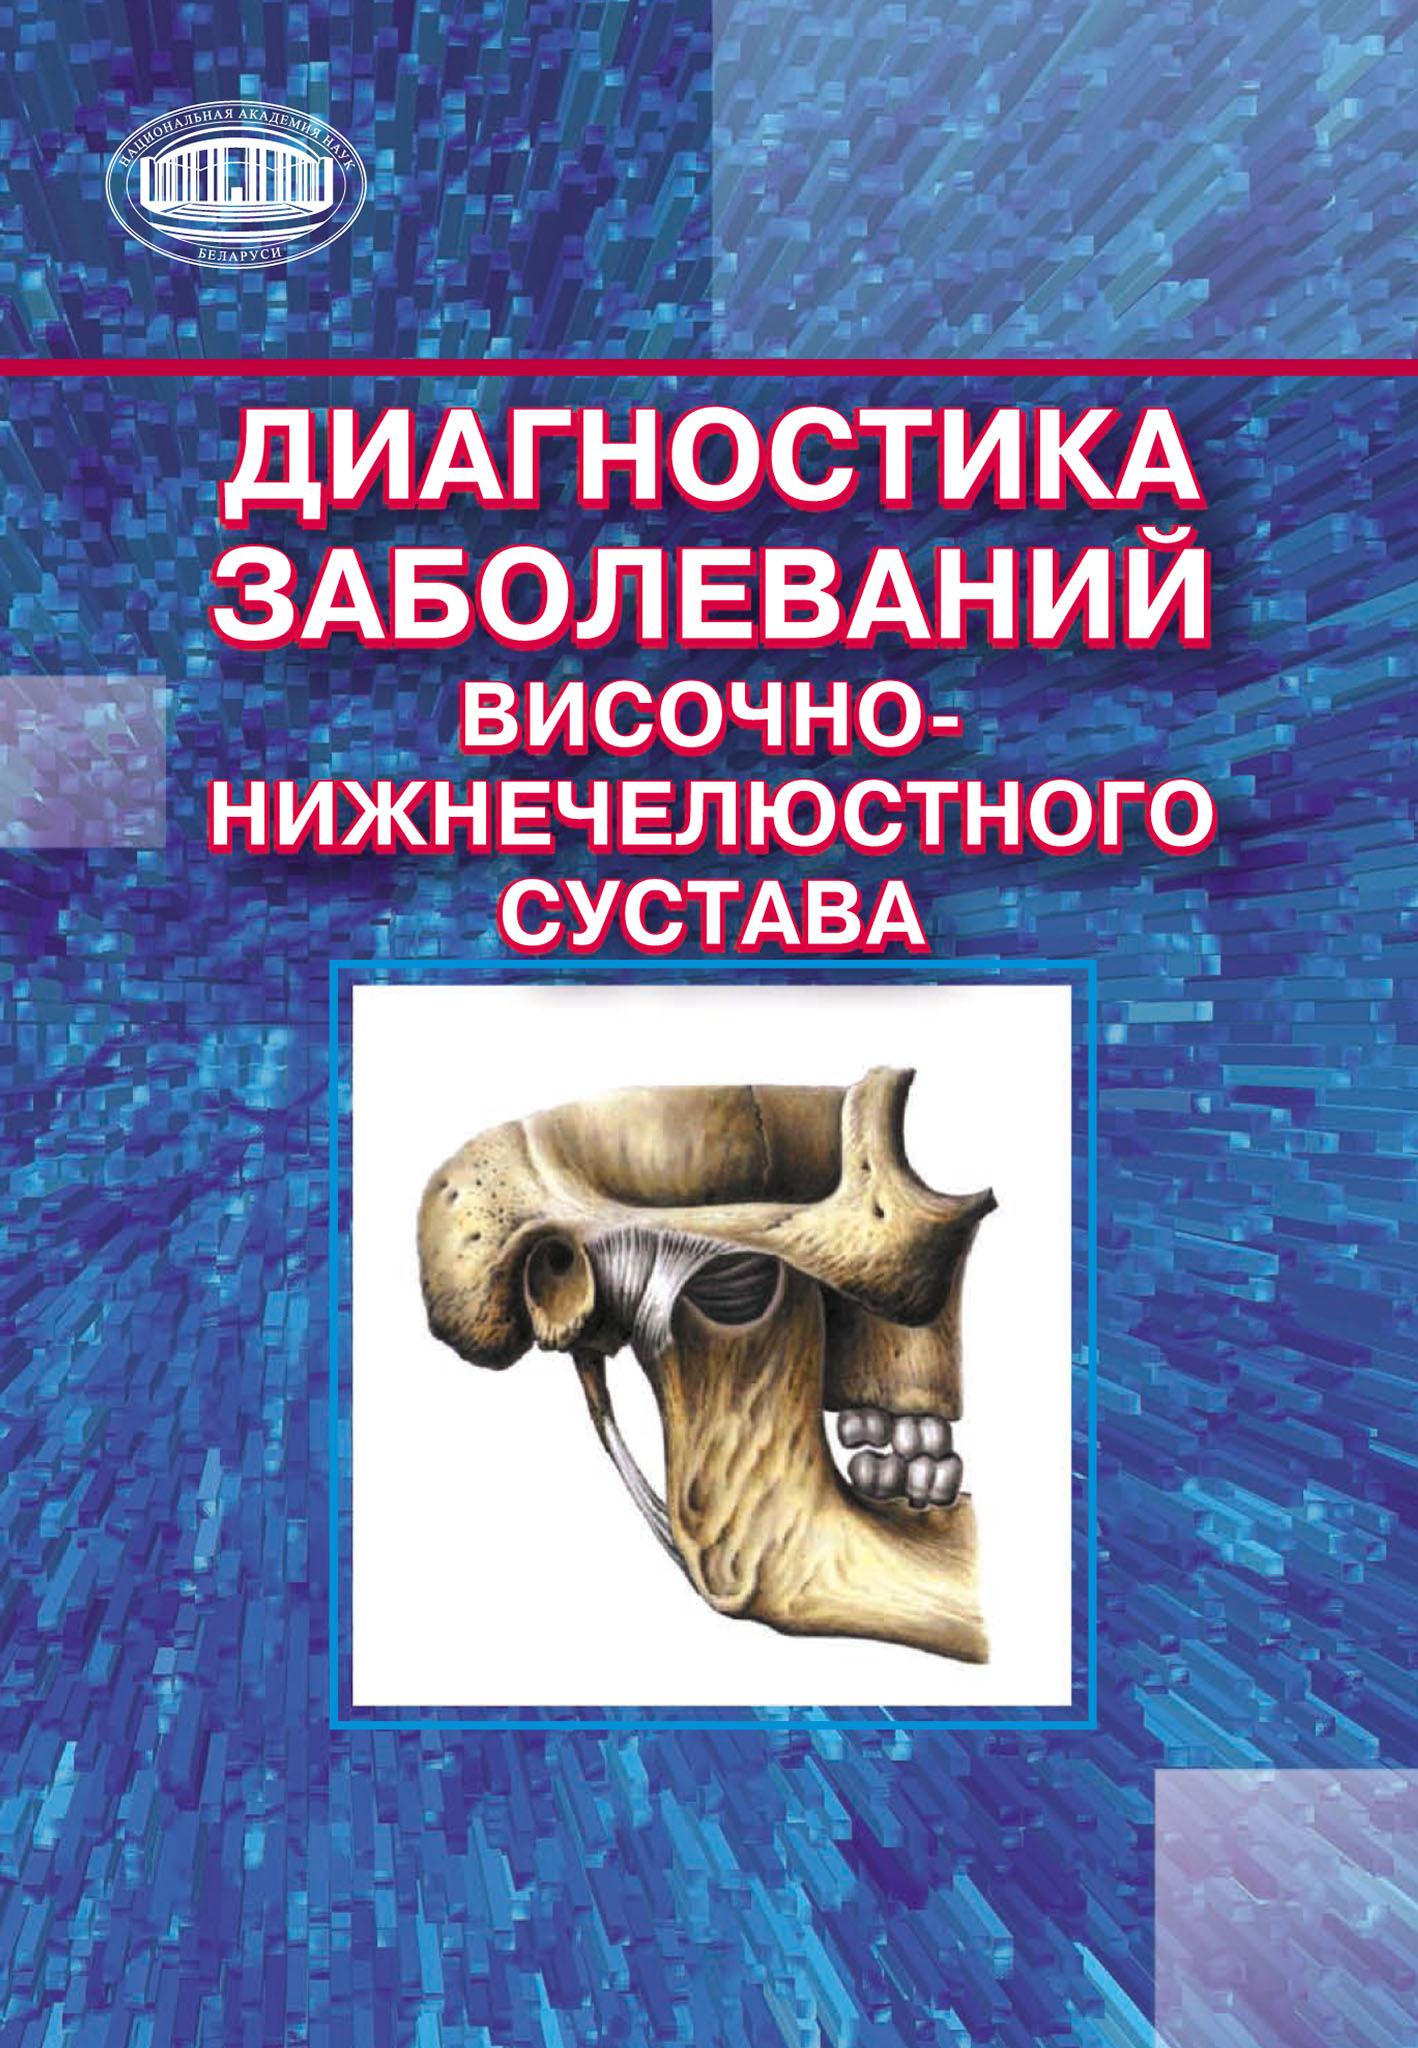 цена на Коллектив авторов Диагностика заболеваний височно-нижнечелюстного сустава